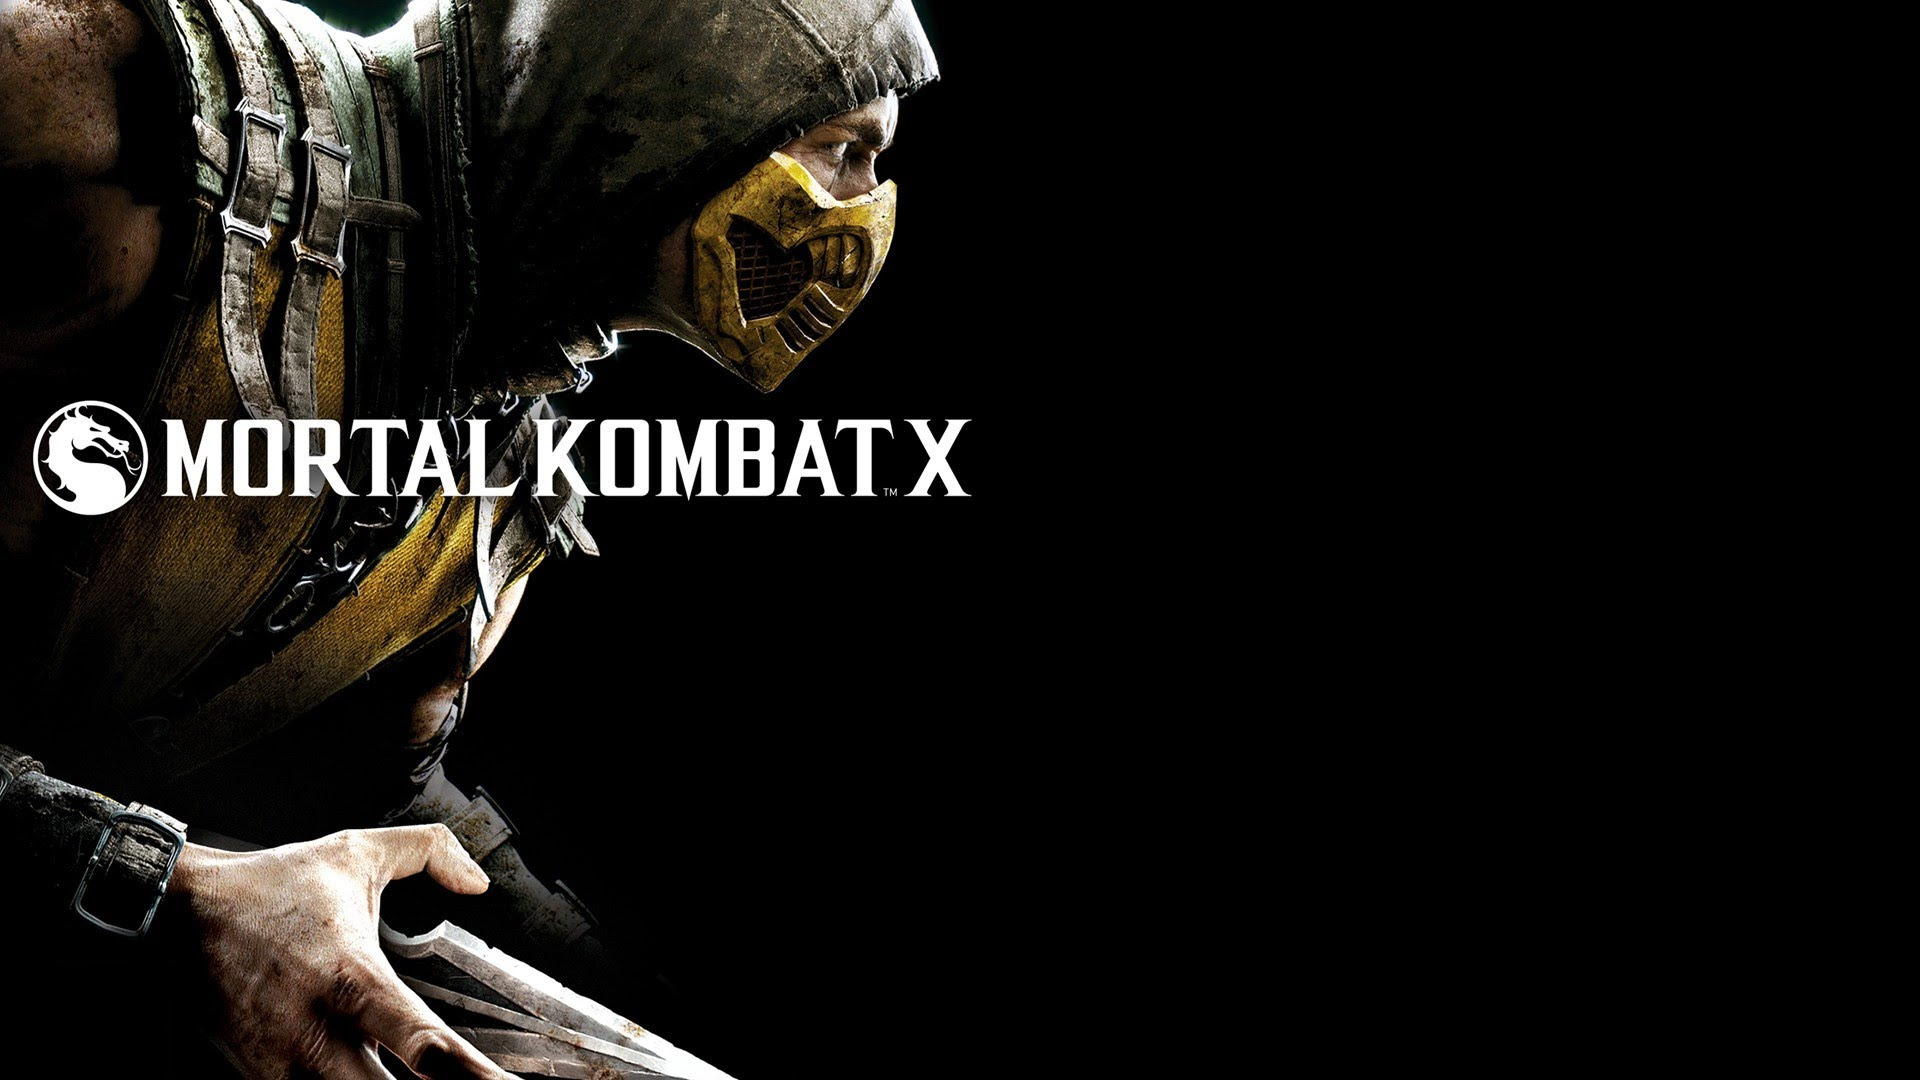 Mortal Kombat X Background Wallpaper 03969 Baltana